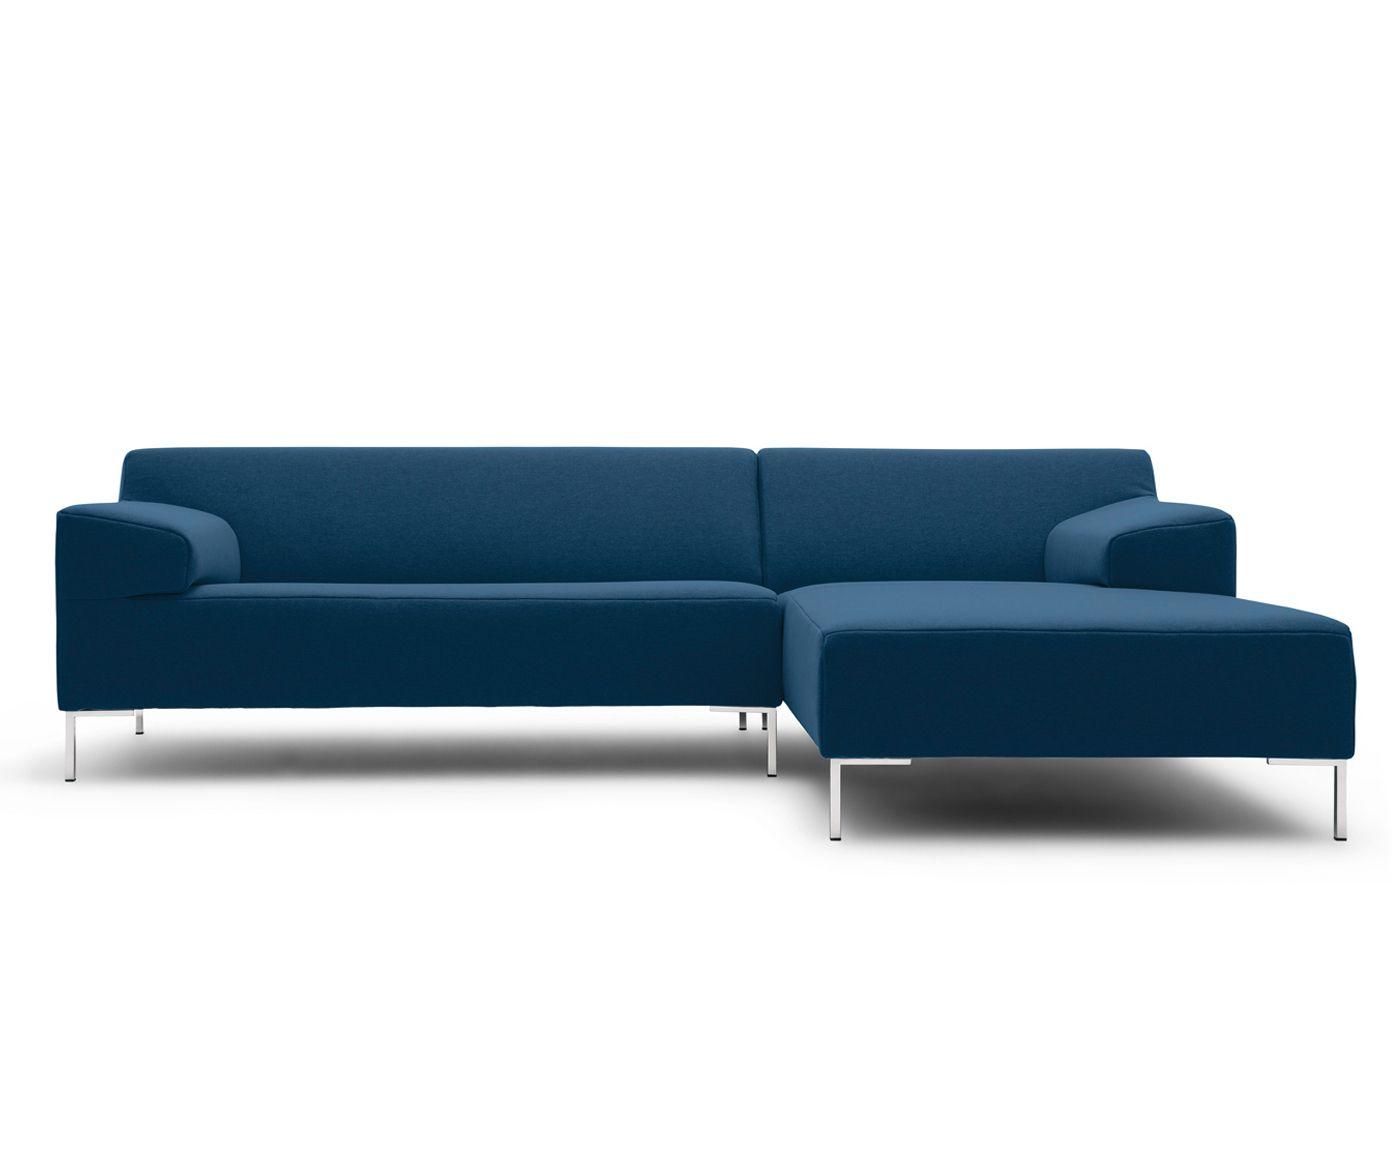 Hoekbank Chaise Lounge.Hoekbank Freistil 180 Met Chaise Longue Rechts Staalblauw